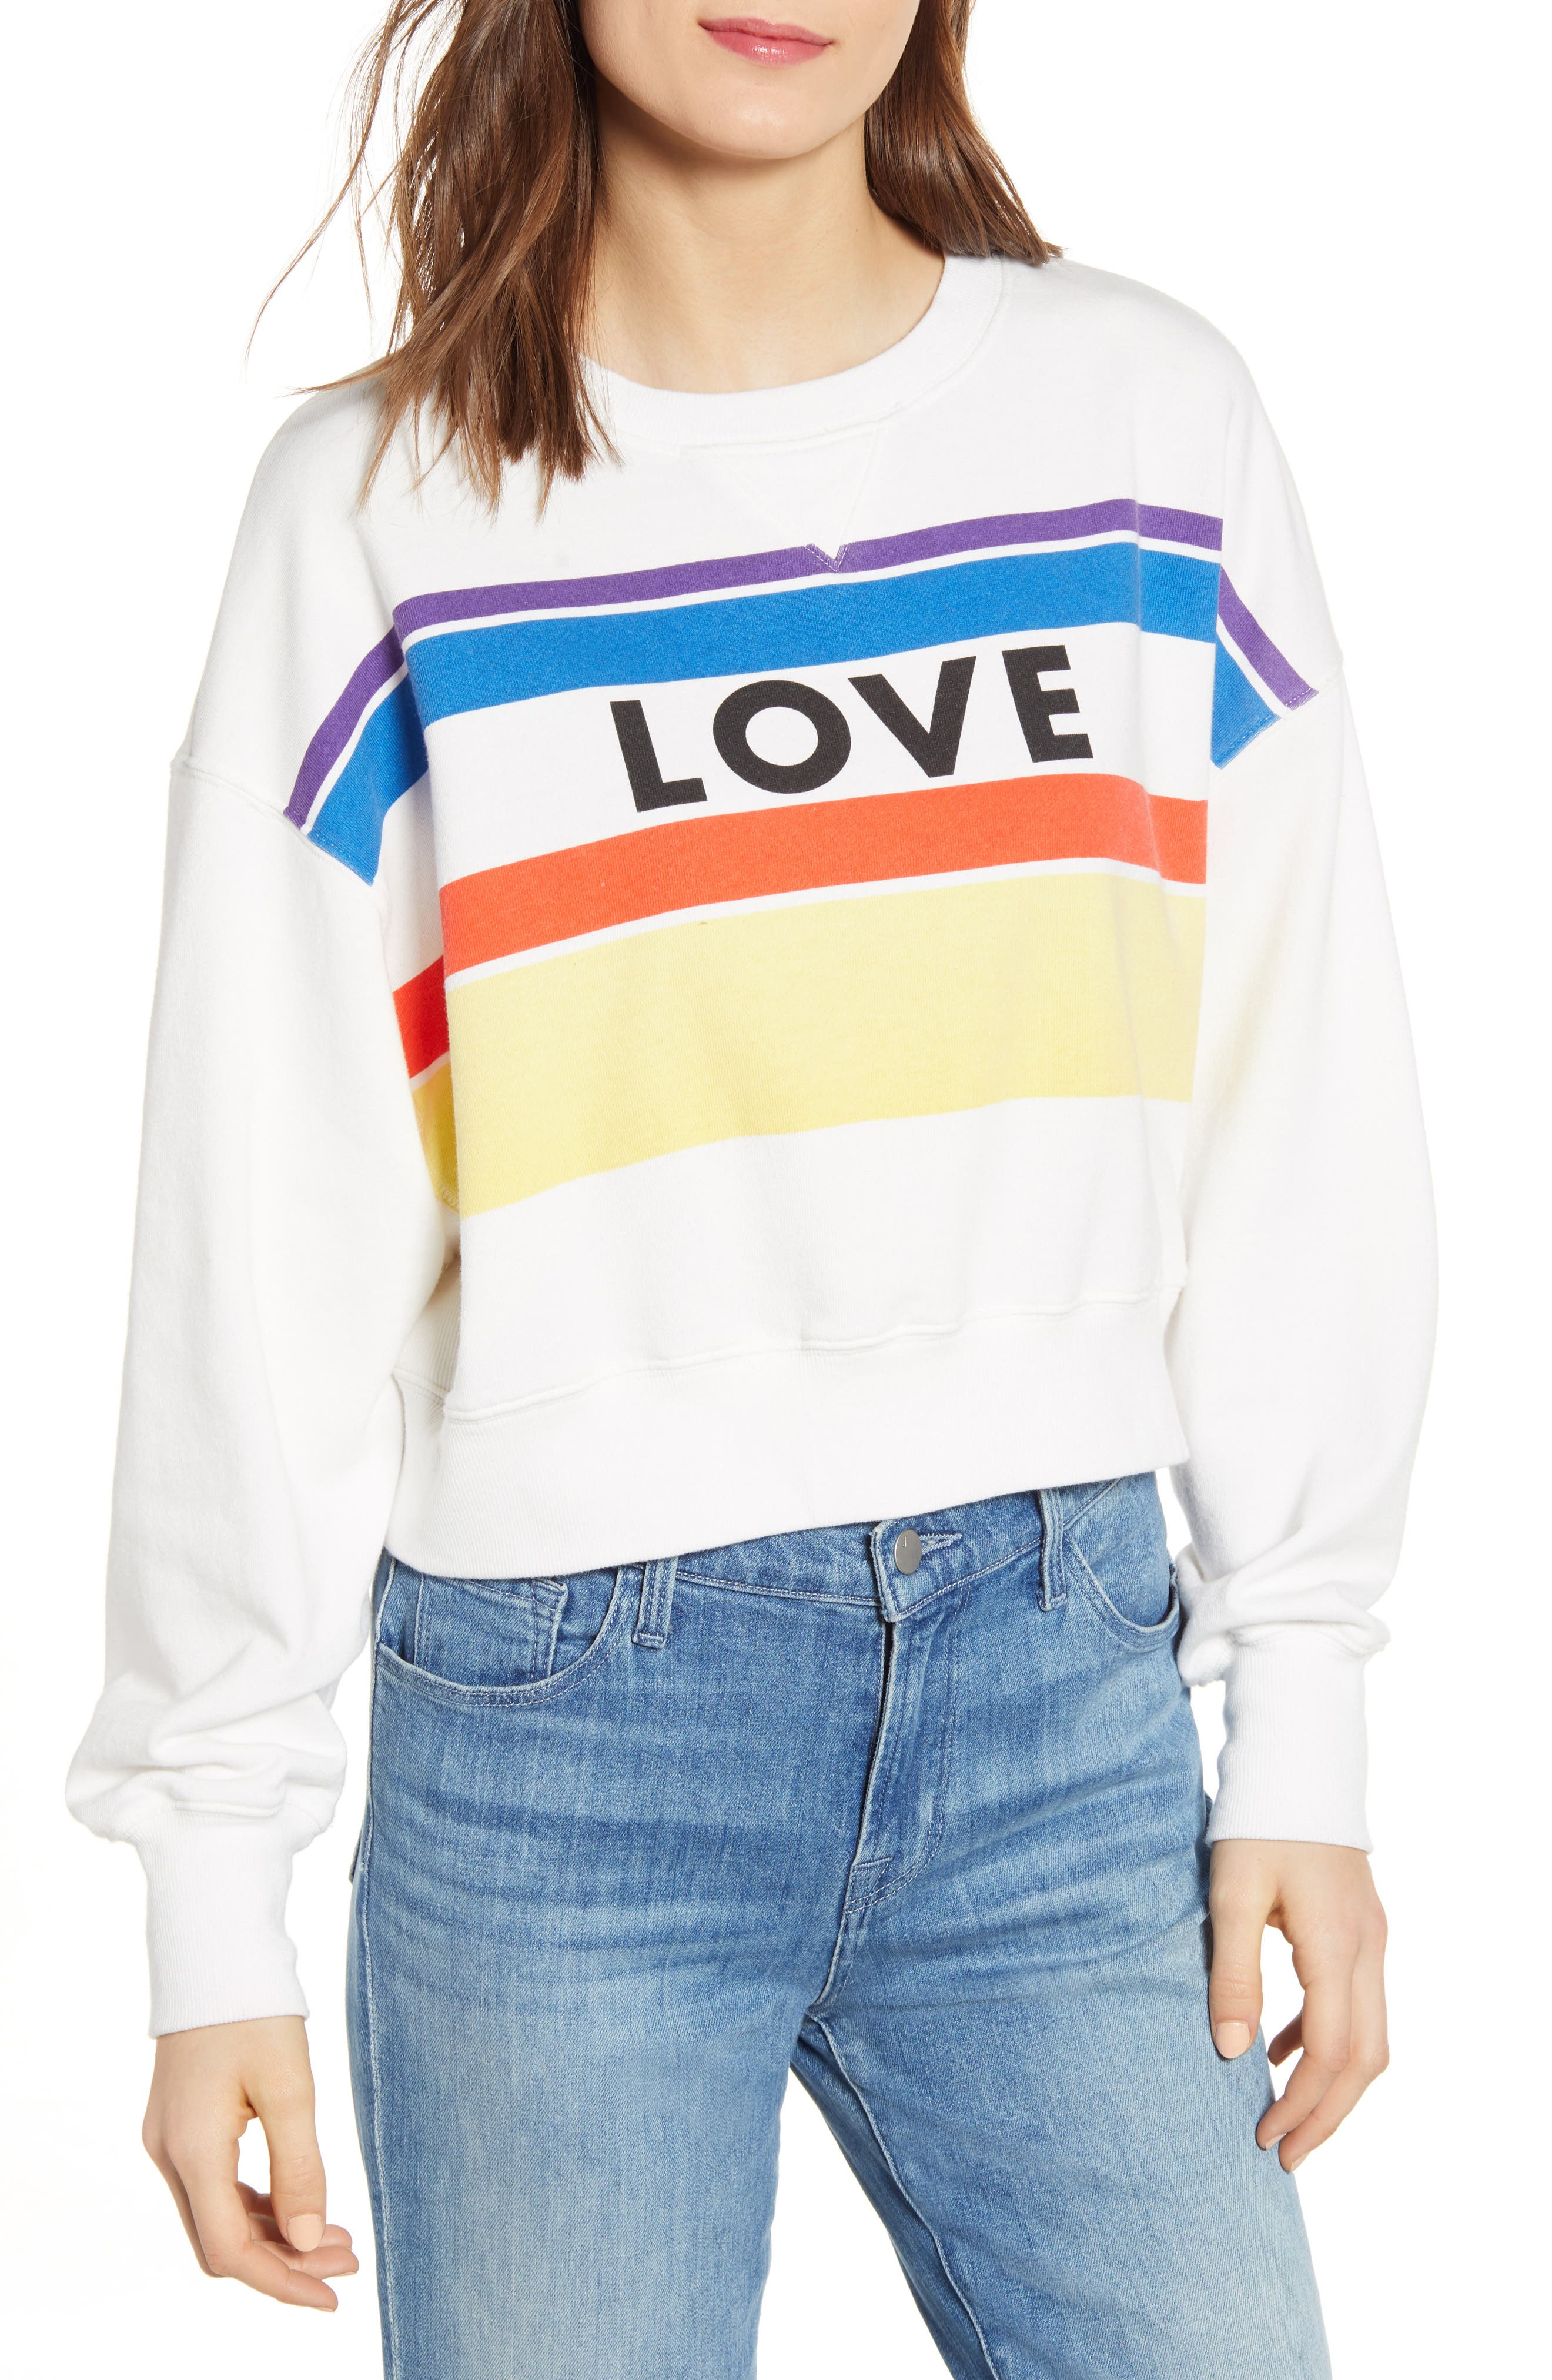 Rebecca Minkoff Ebony Love Stripe Graphic Sweatshirt, White